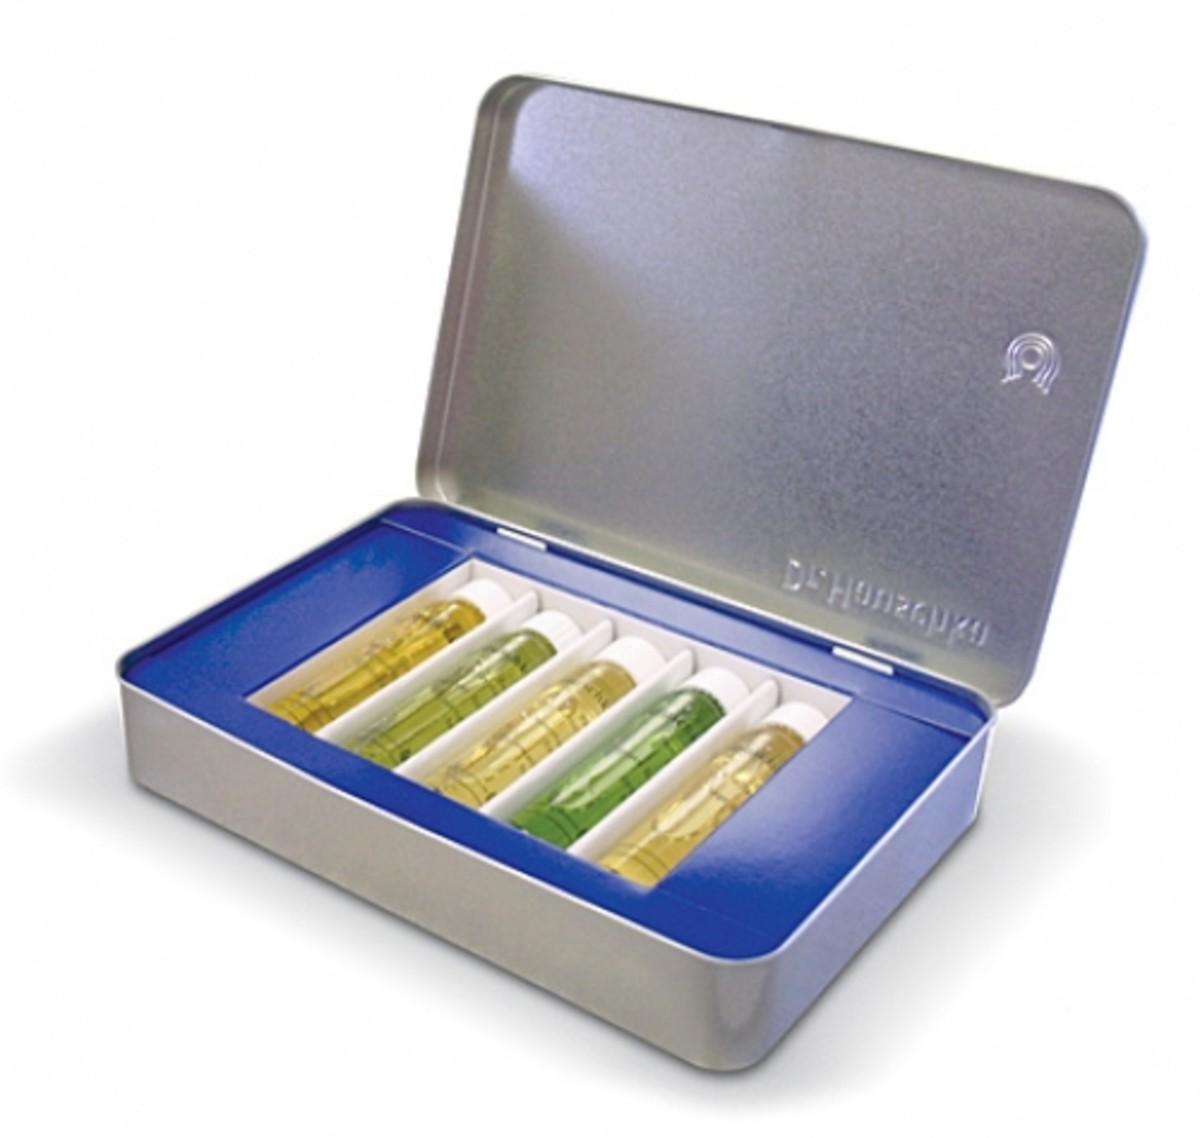 Dr-Hauschka-Aromatherapy-Bath-Kit